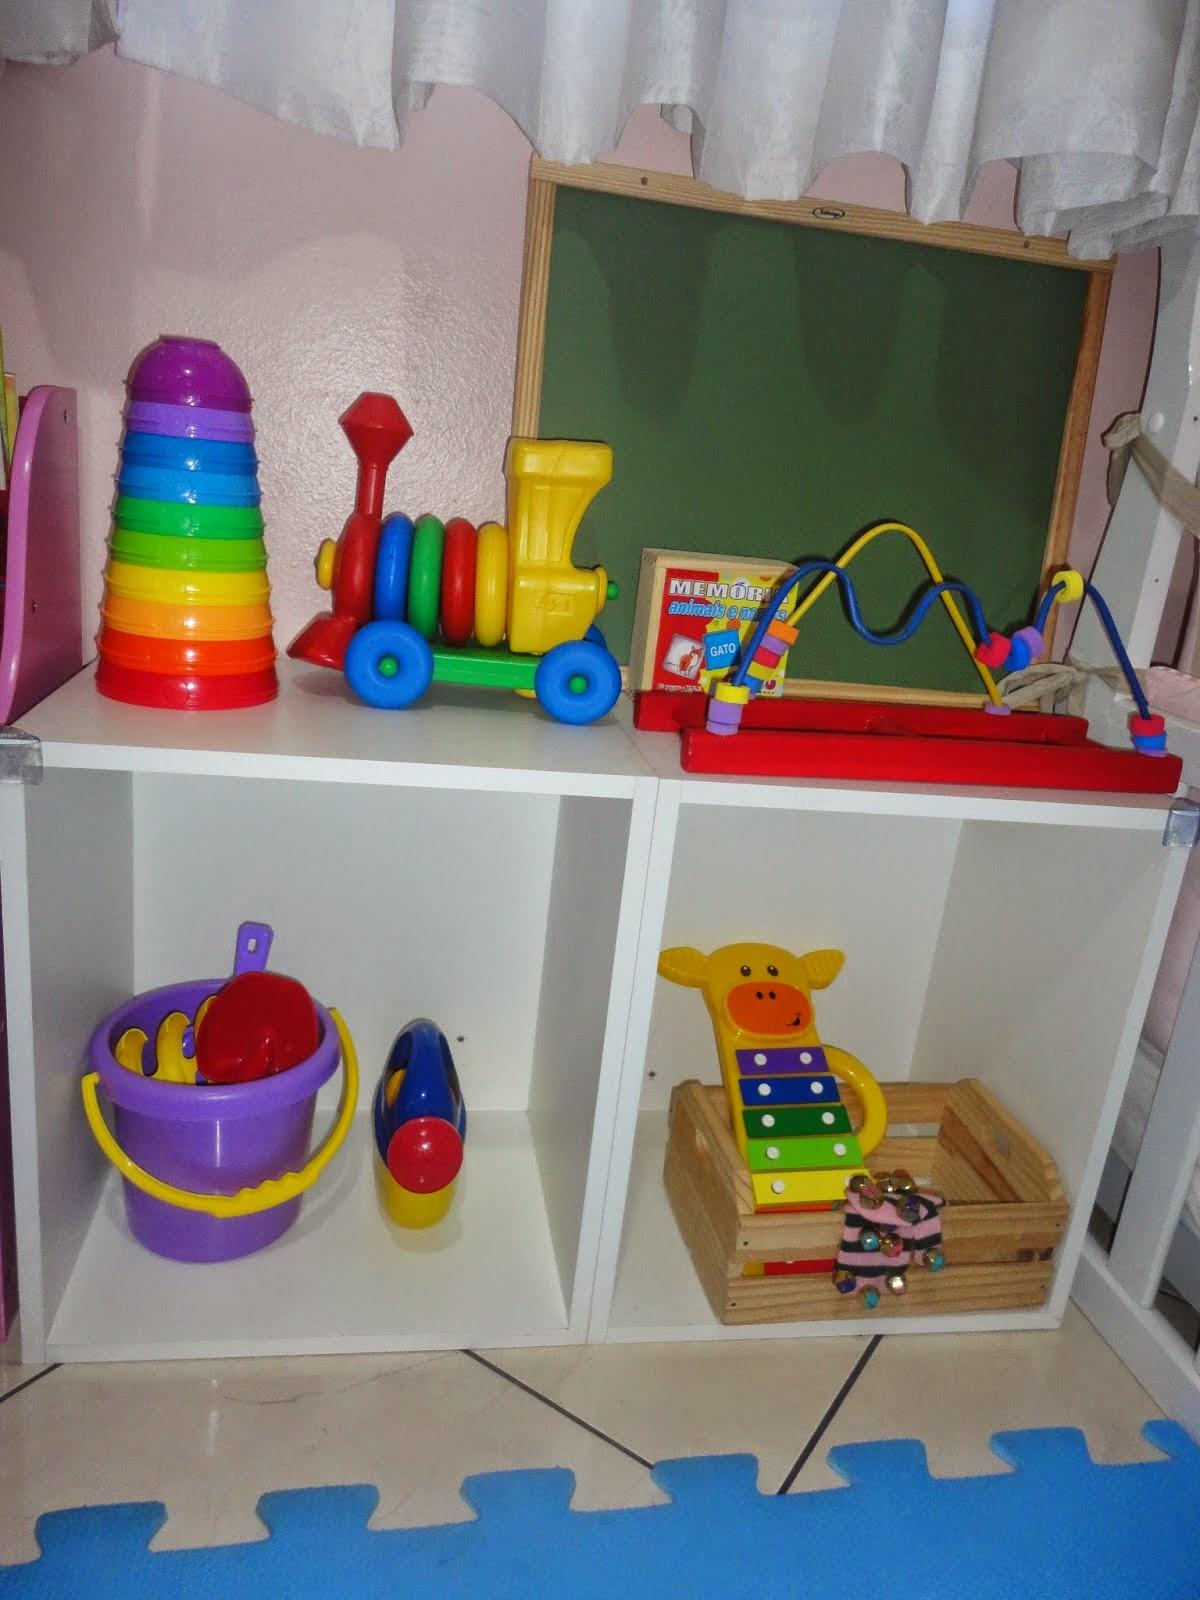 Intitulando o intitul vel a transforma o montessori - Pomos armarios infantiles ...